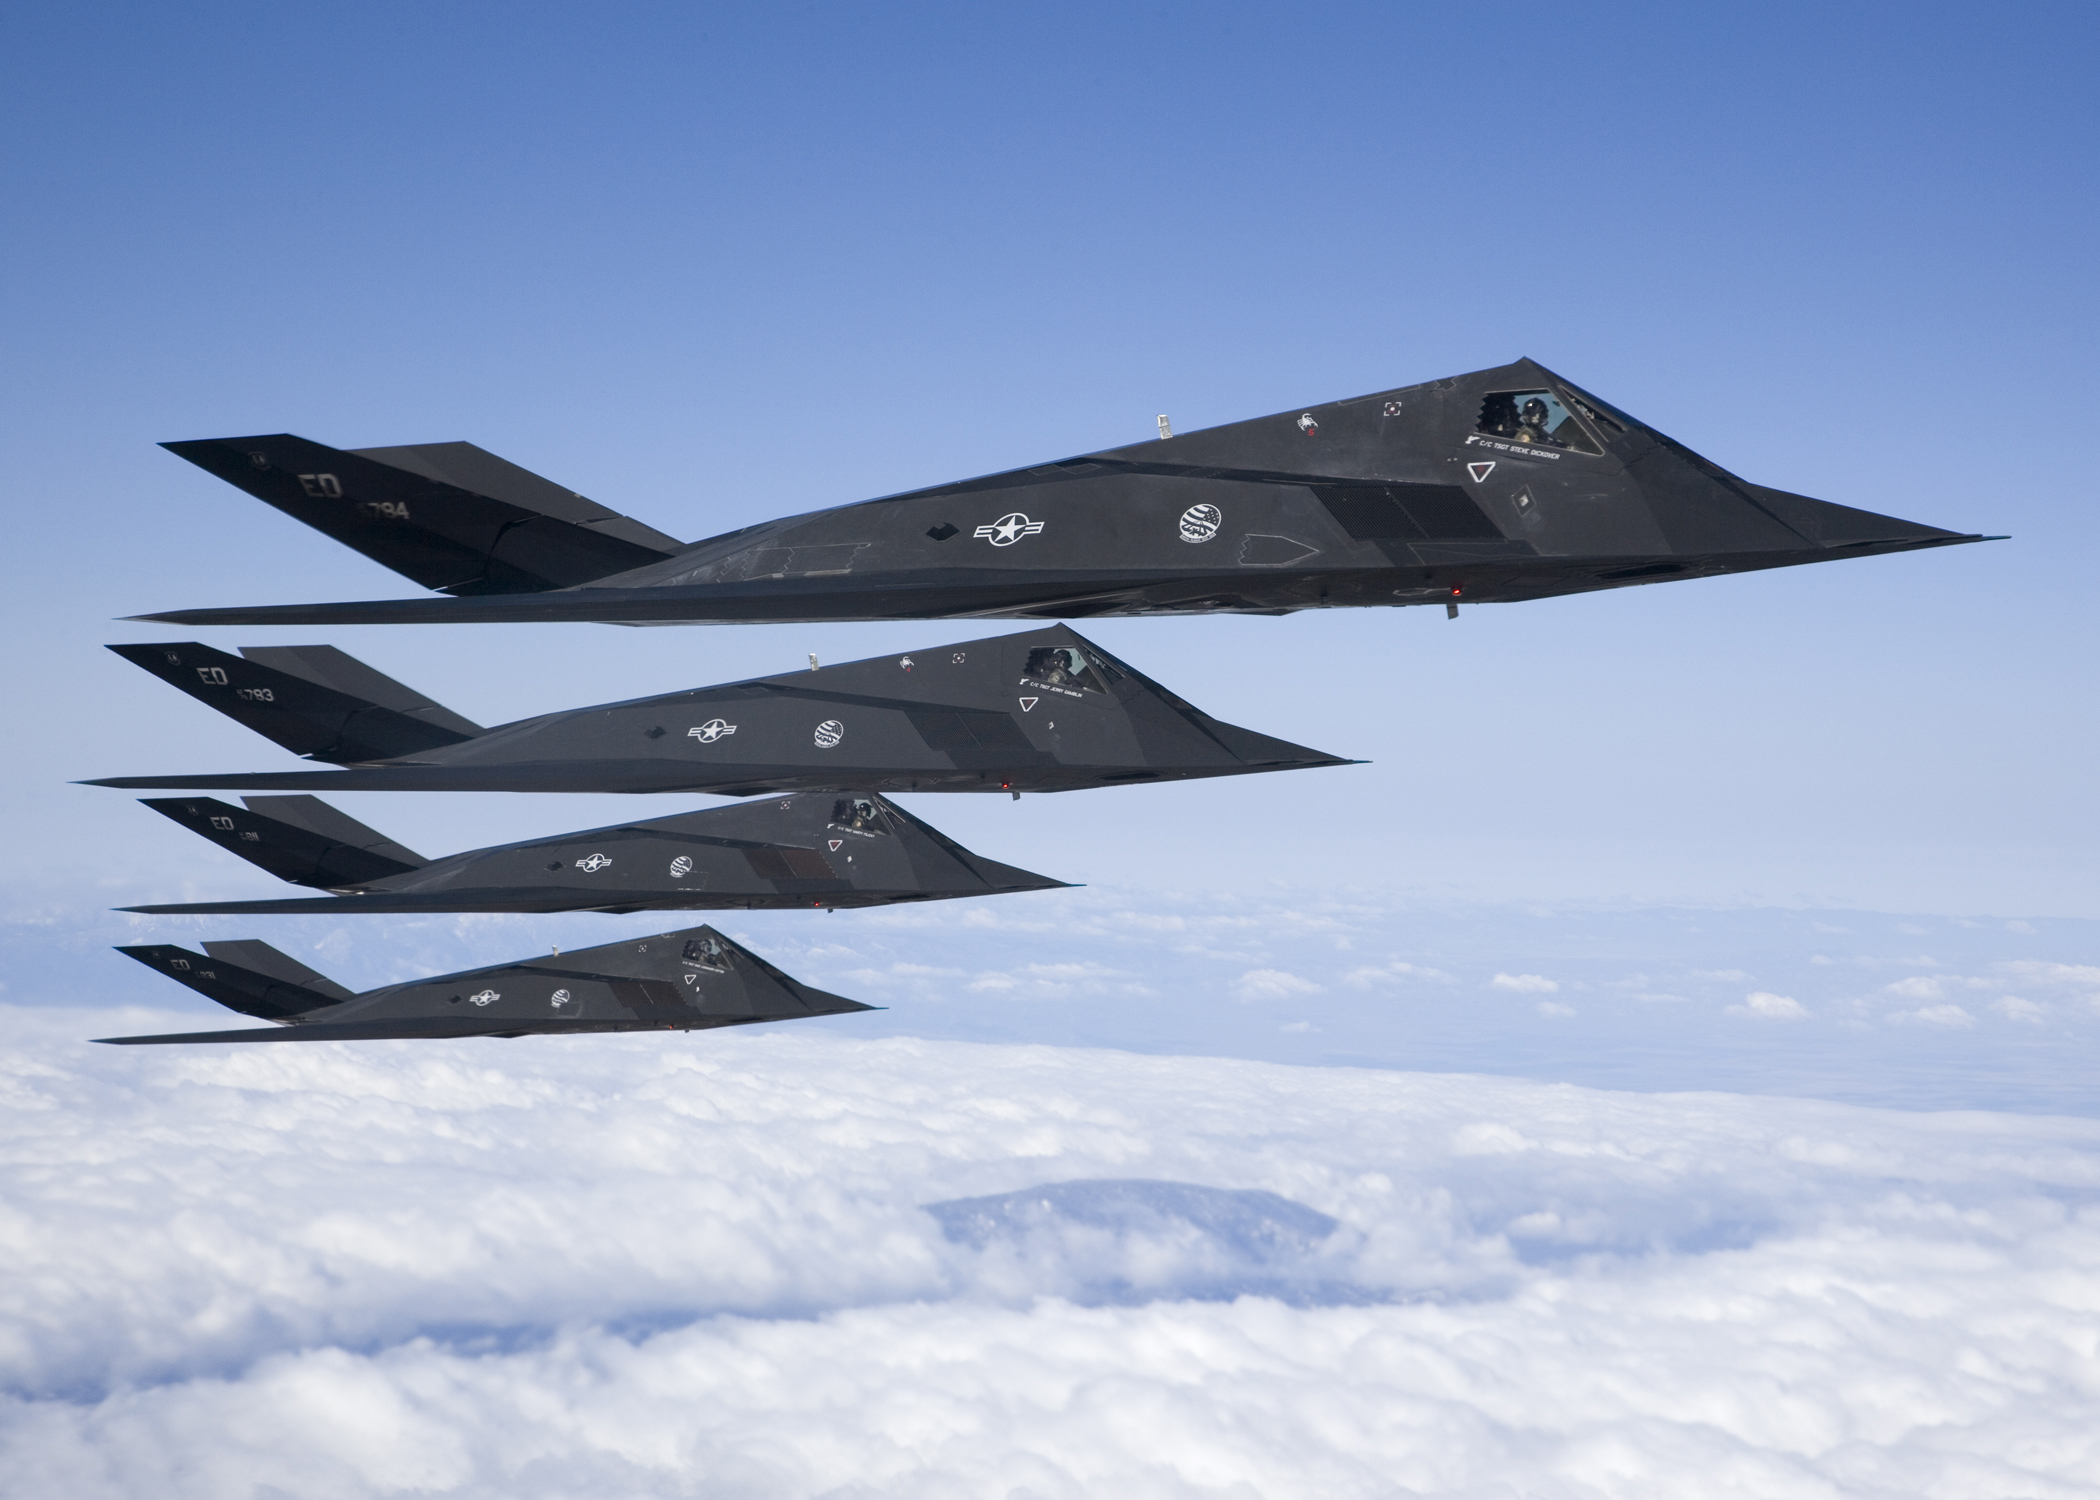 Northrop Grumman B-2 Spirit Bombers